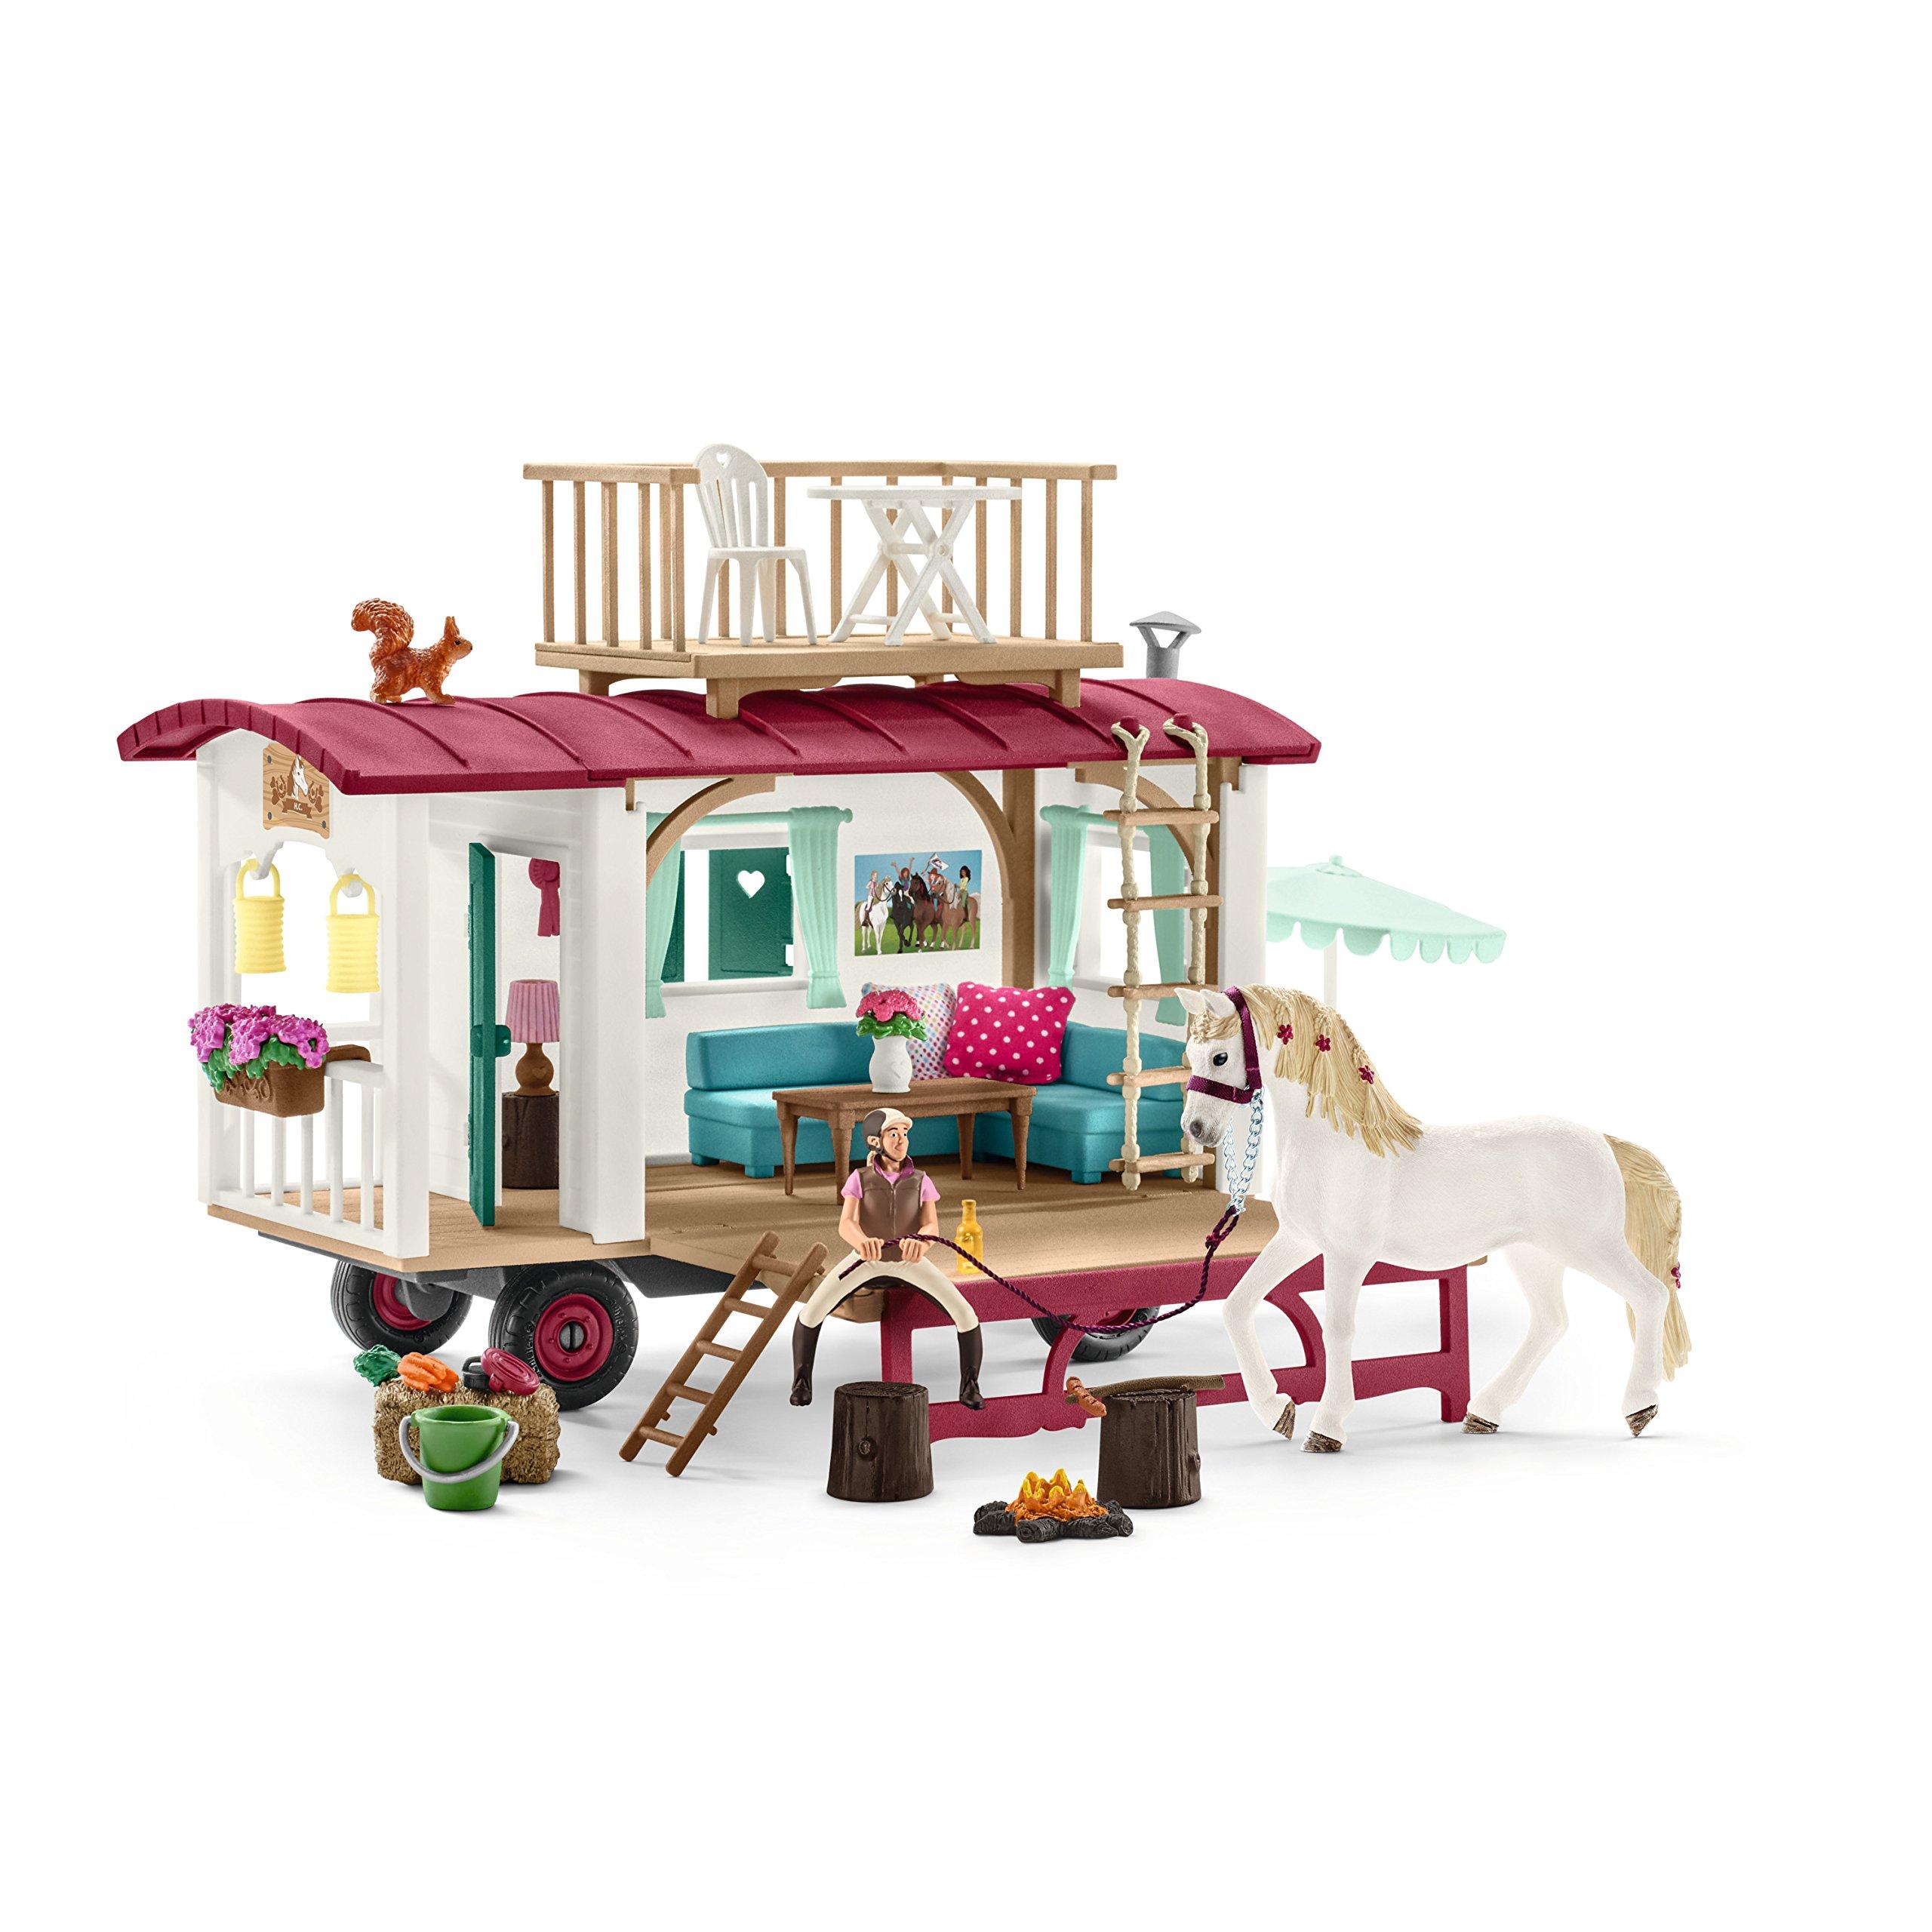 Schleich 42415 Caravan for Secret Club Meetings Play Set, Multicolor by Schleich (Image #2)